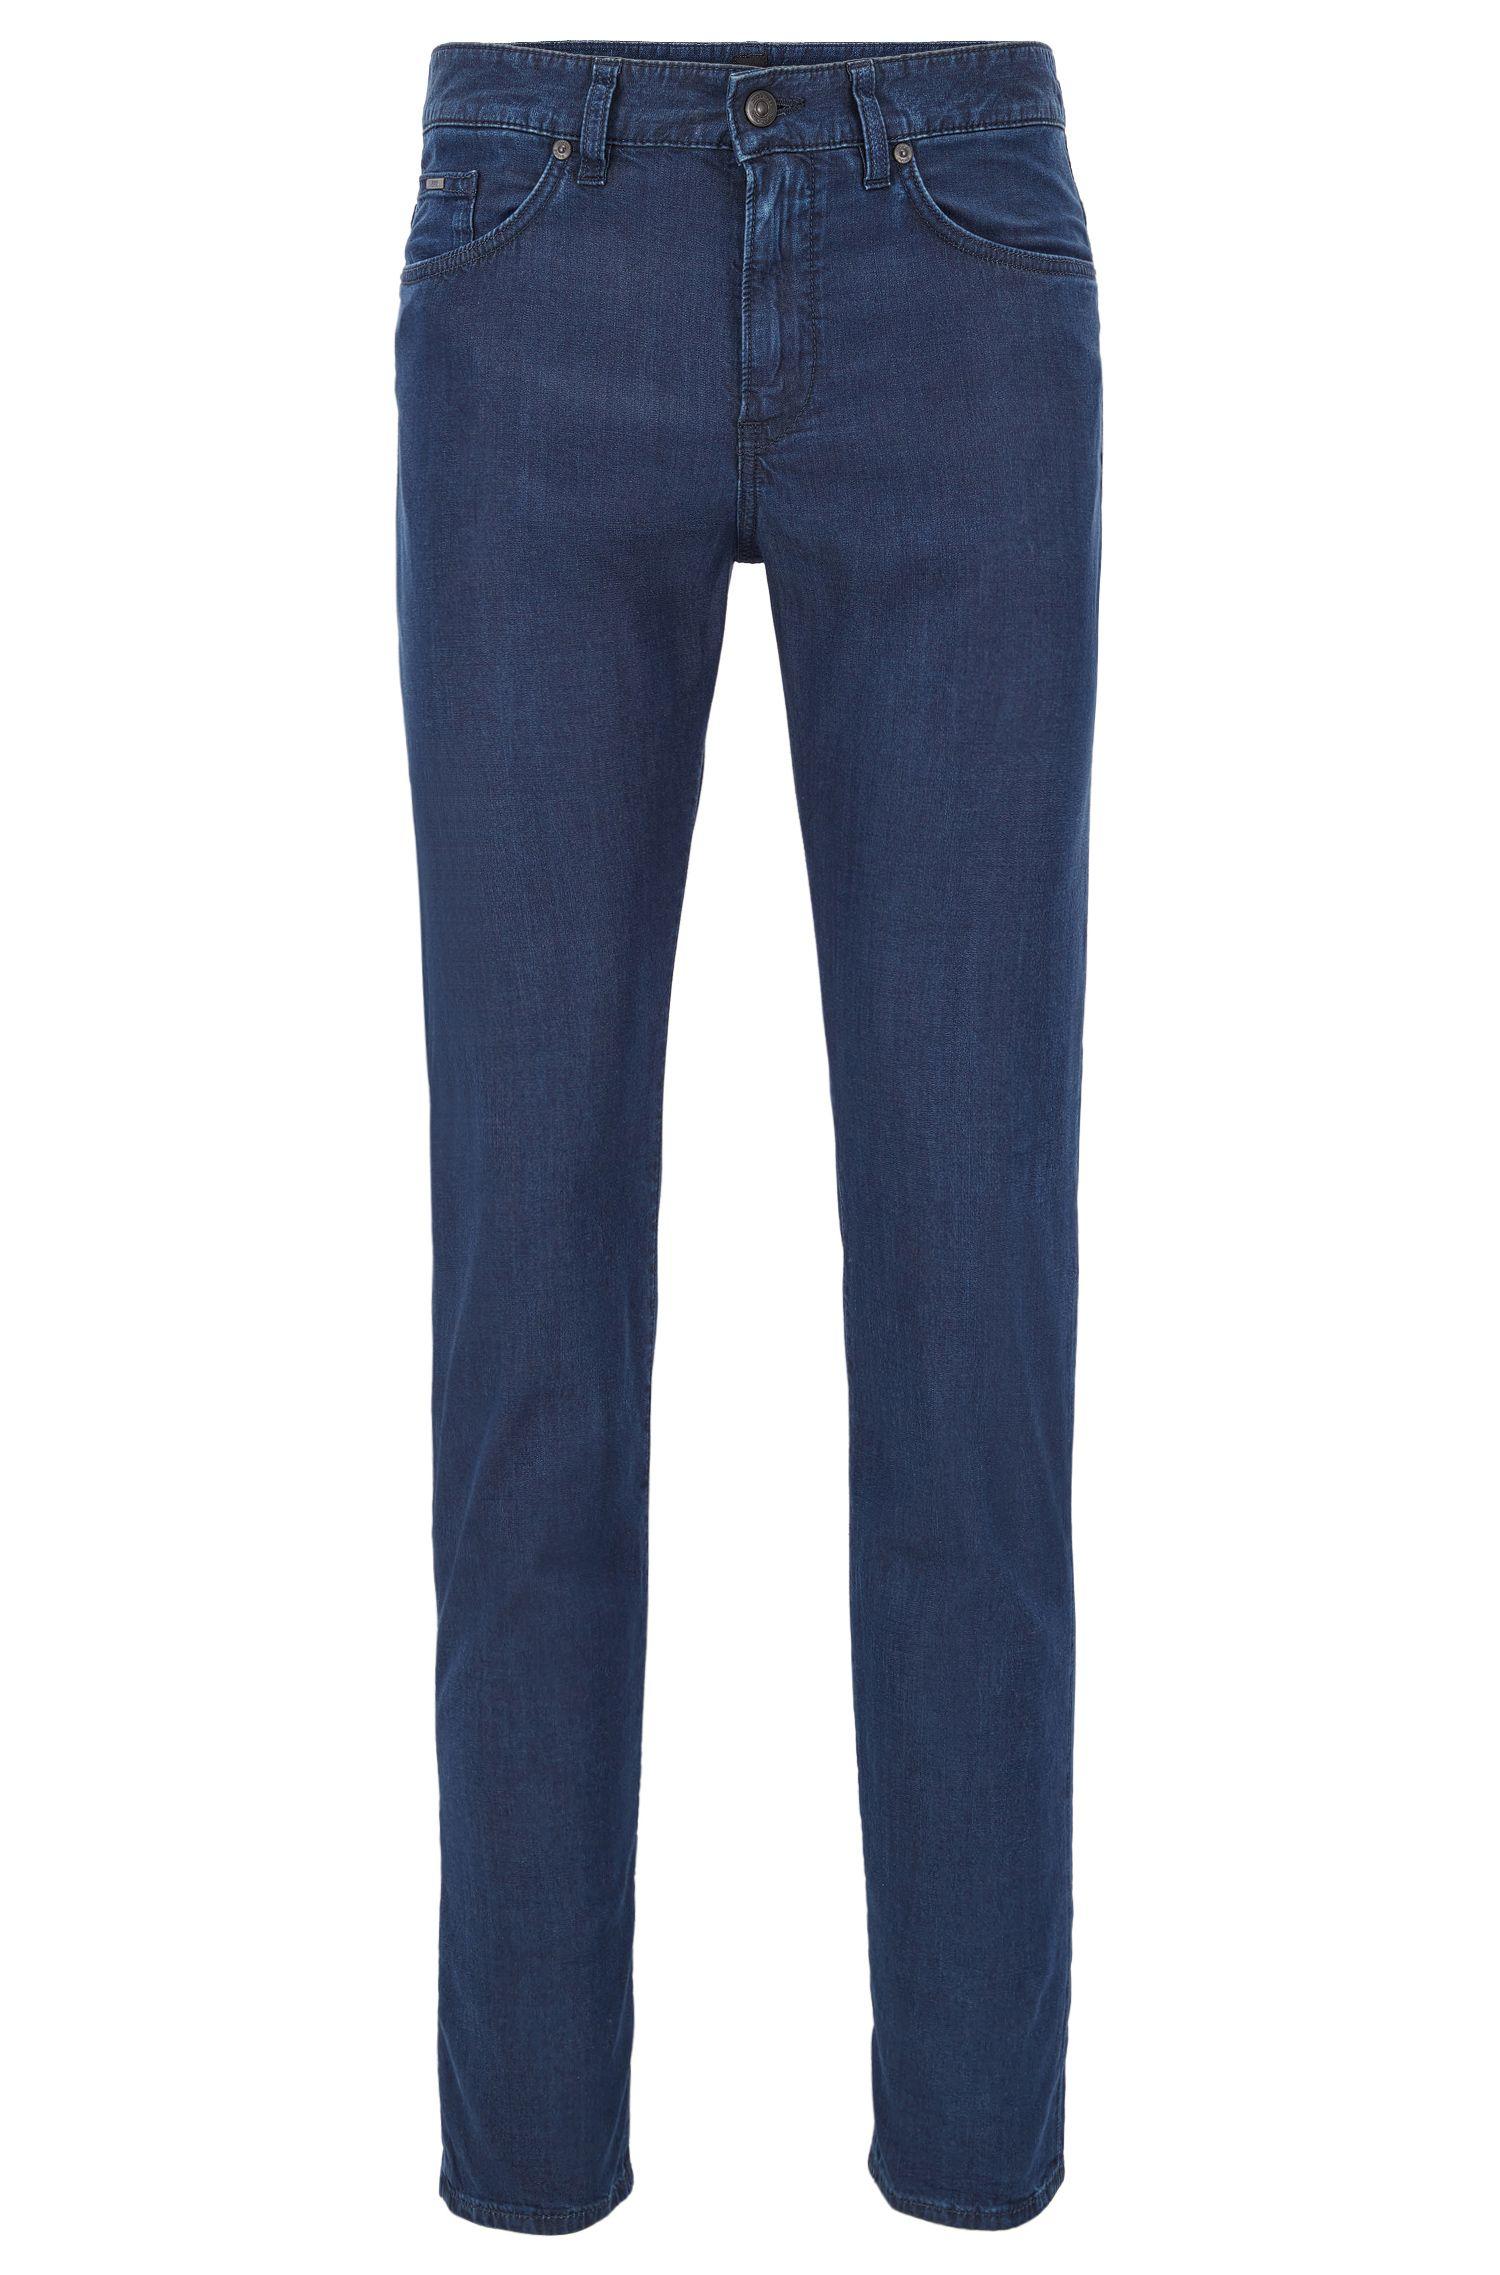 Stretch Jean, Slim Fit | Delaware, Dark Blue